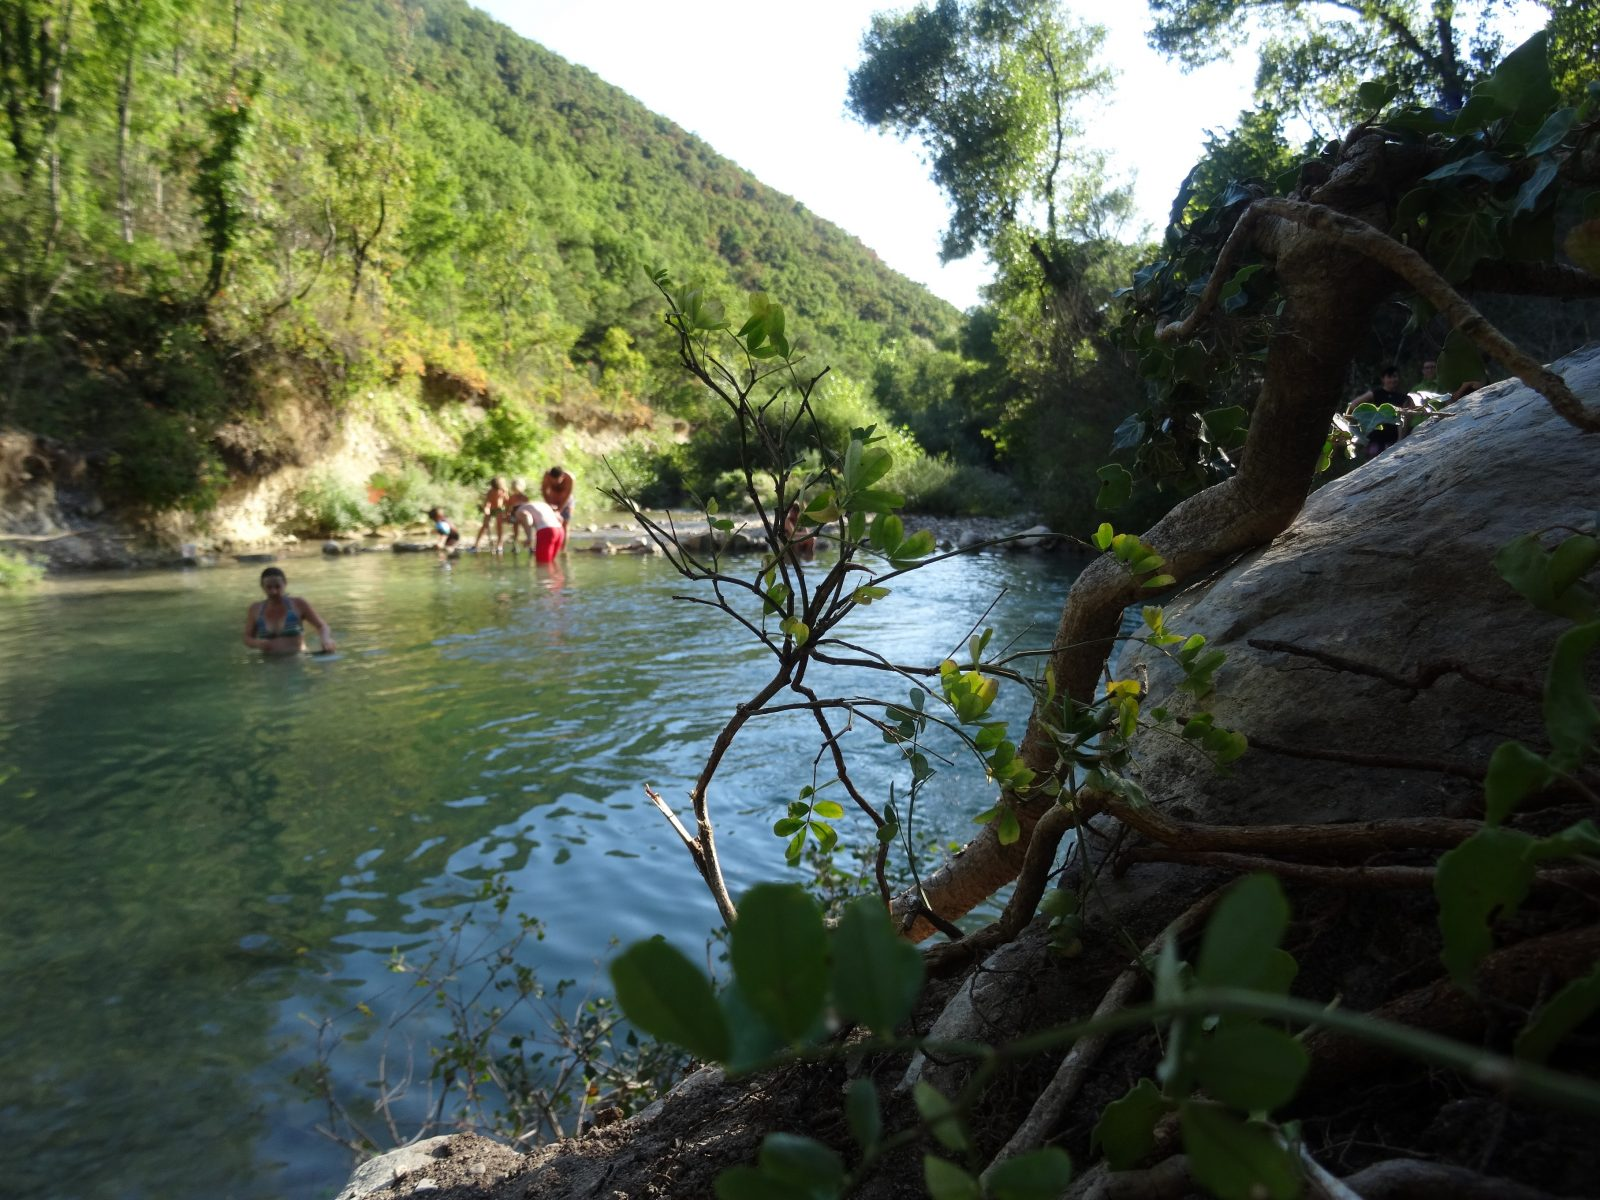 Baignade dans la Gervanne